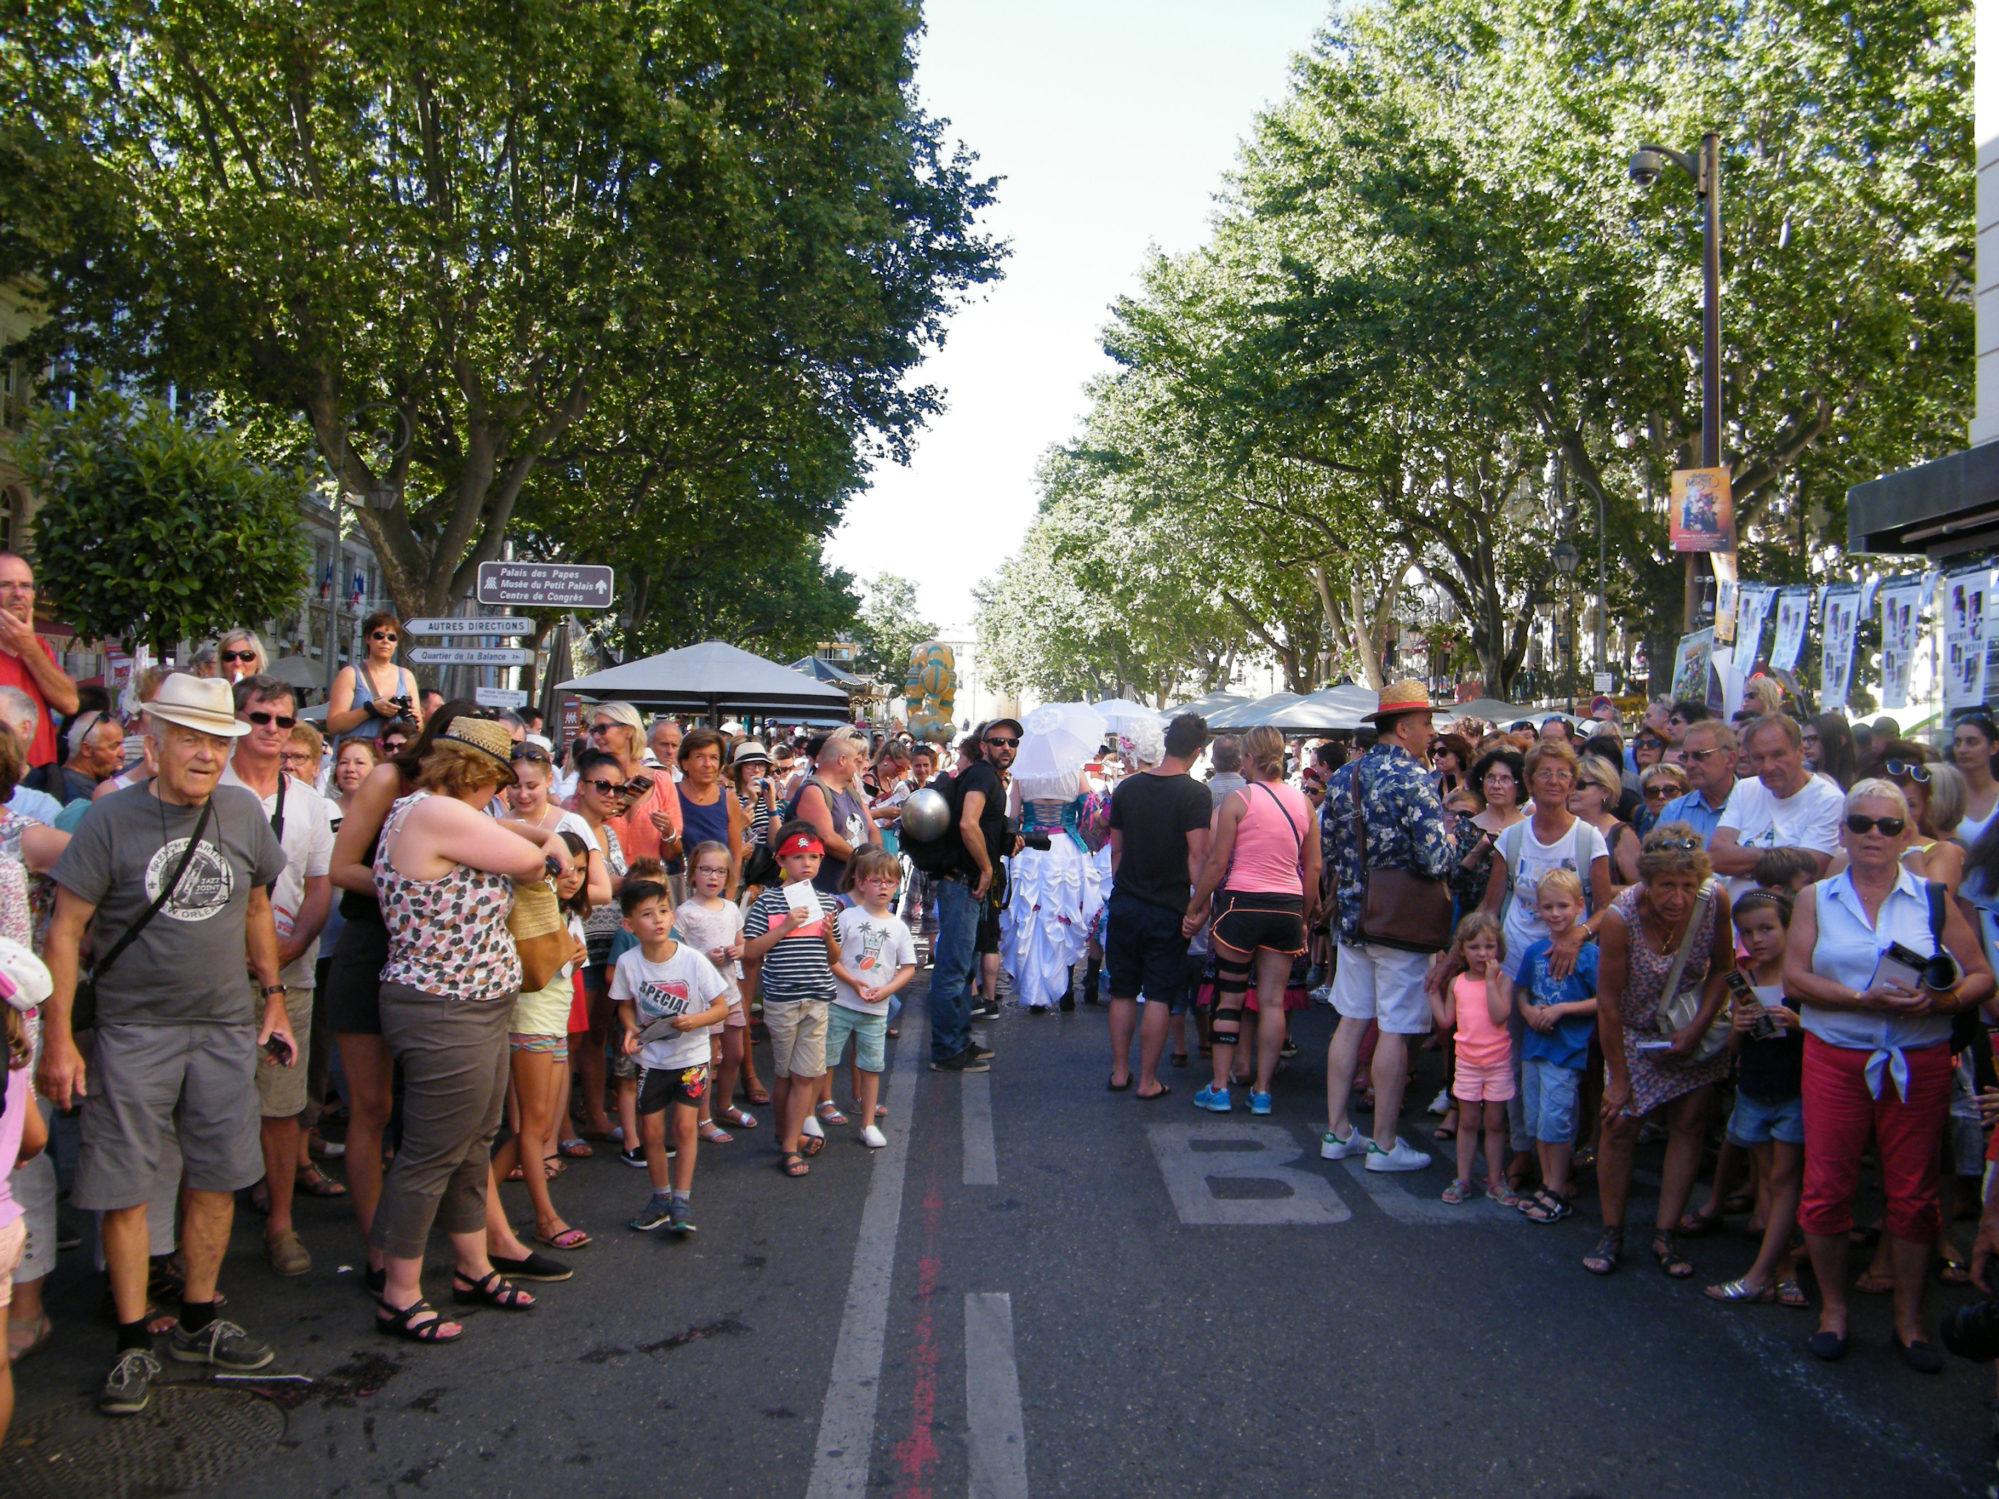 festival avignon off arrivée parade